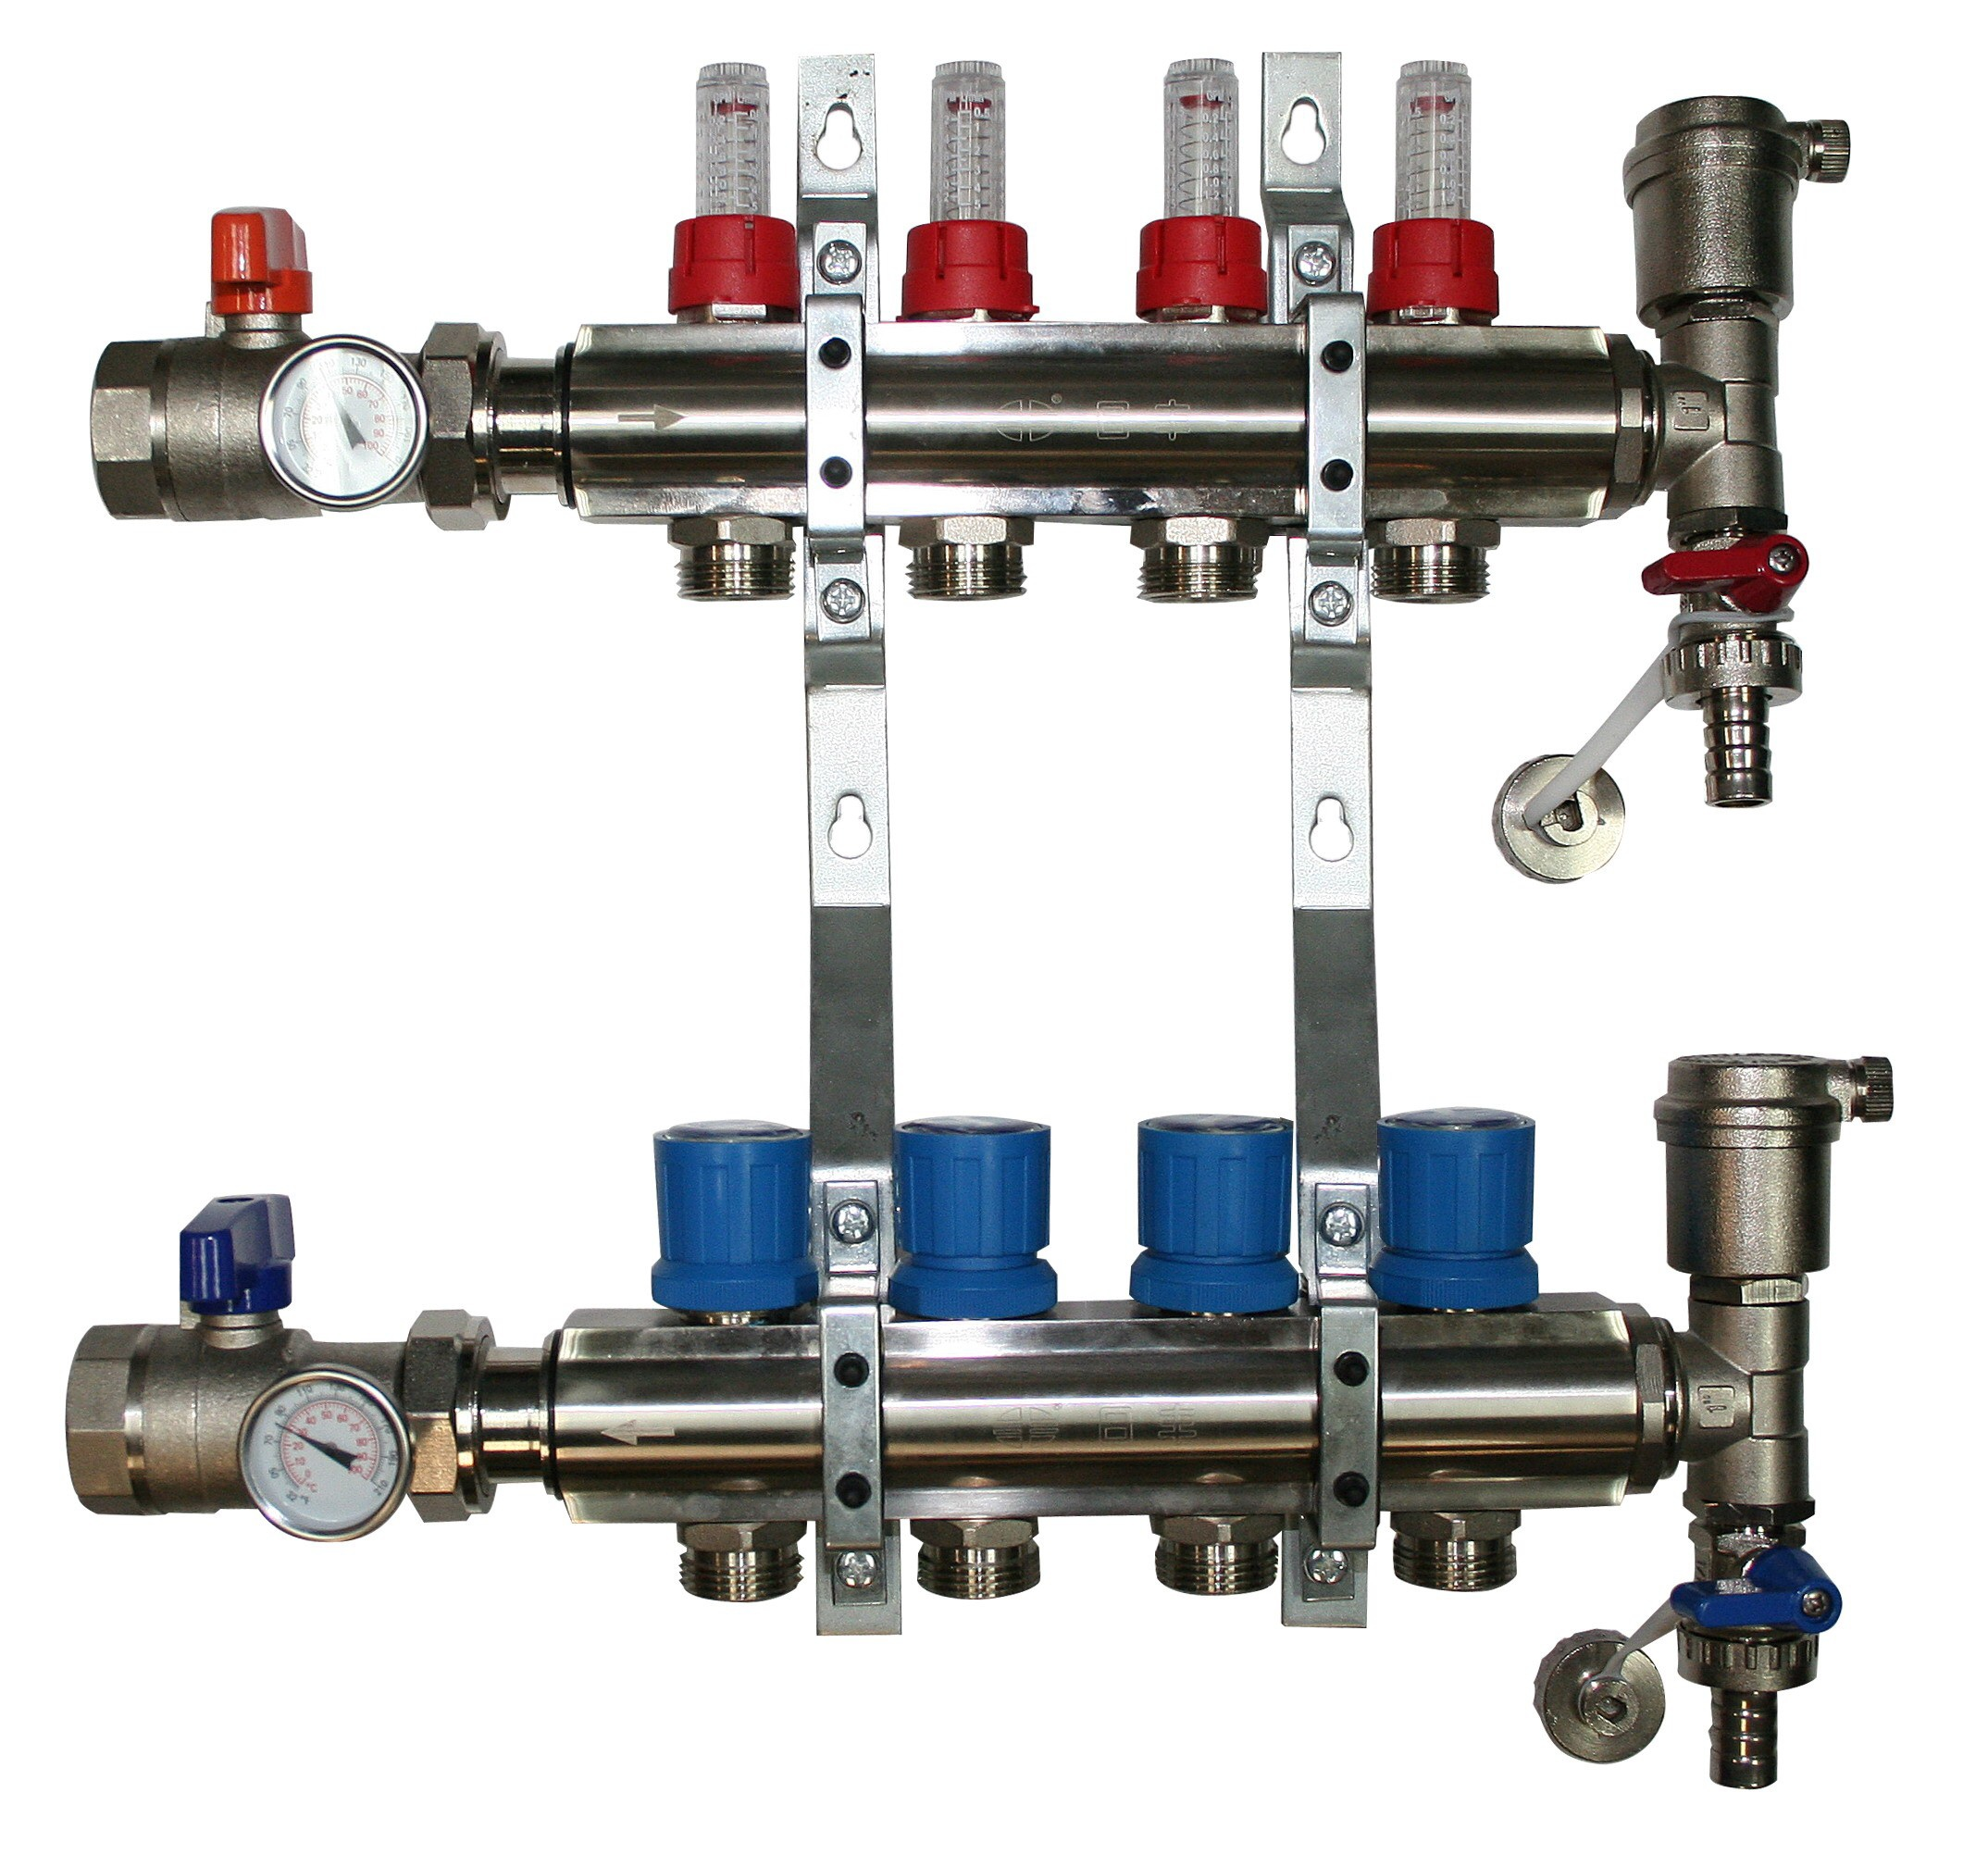 2 Port Underfloor Heating Manifold Rifeng